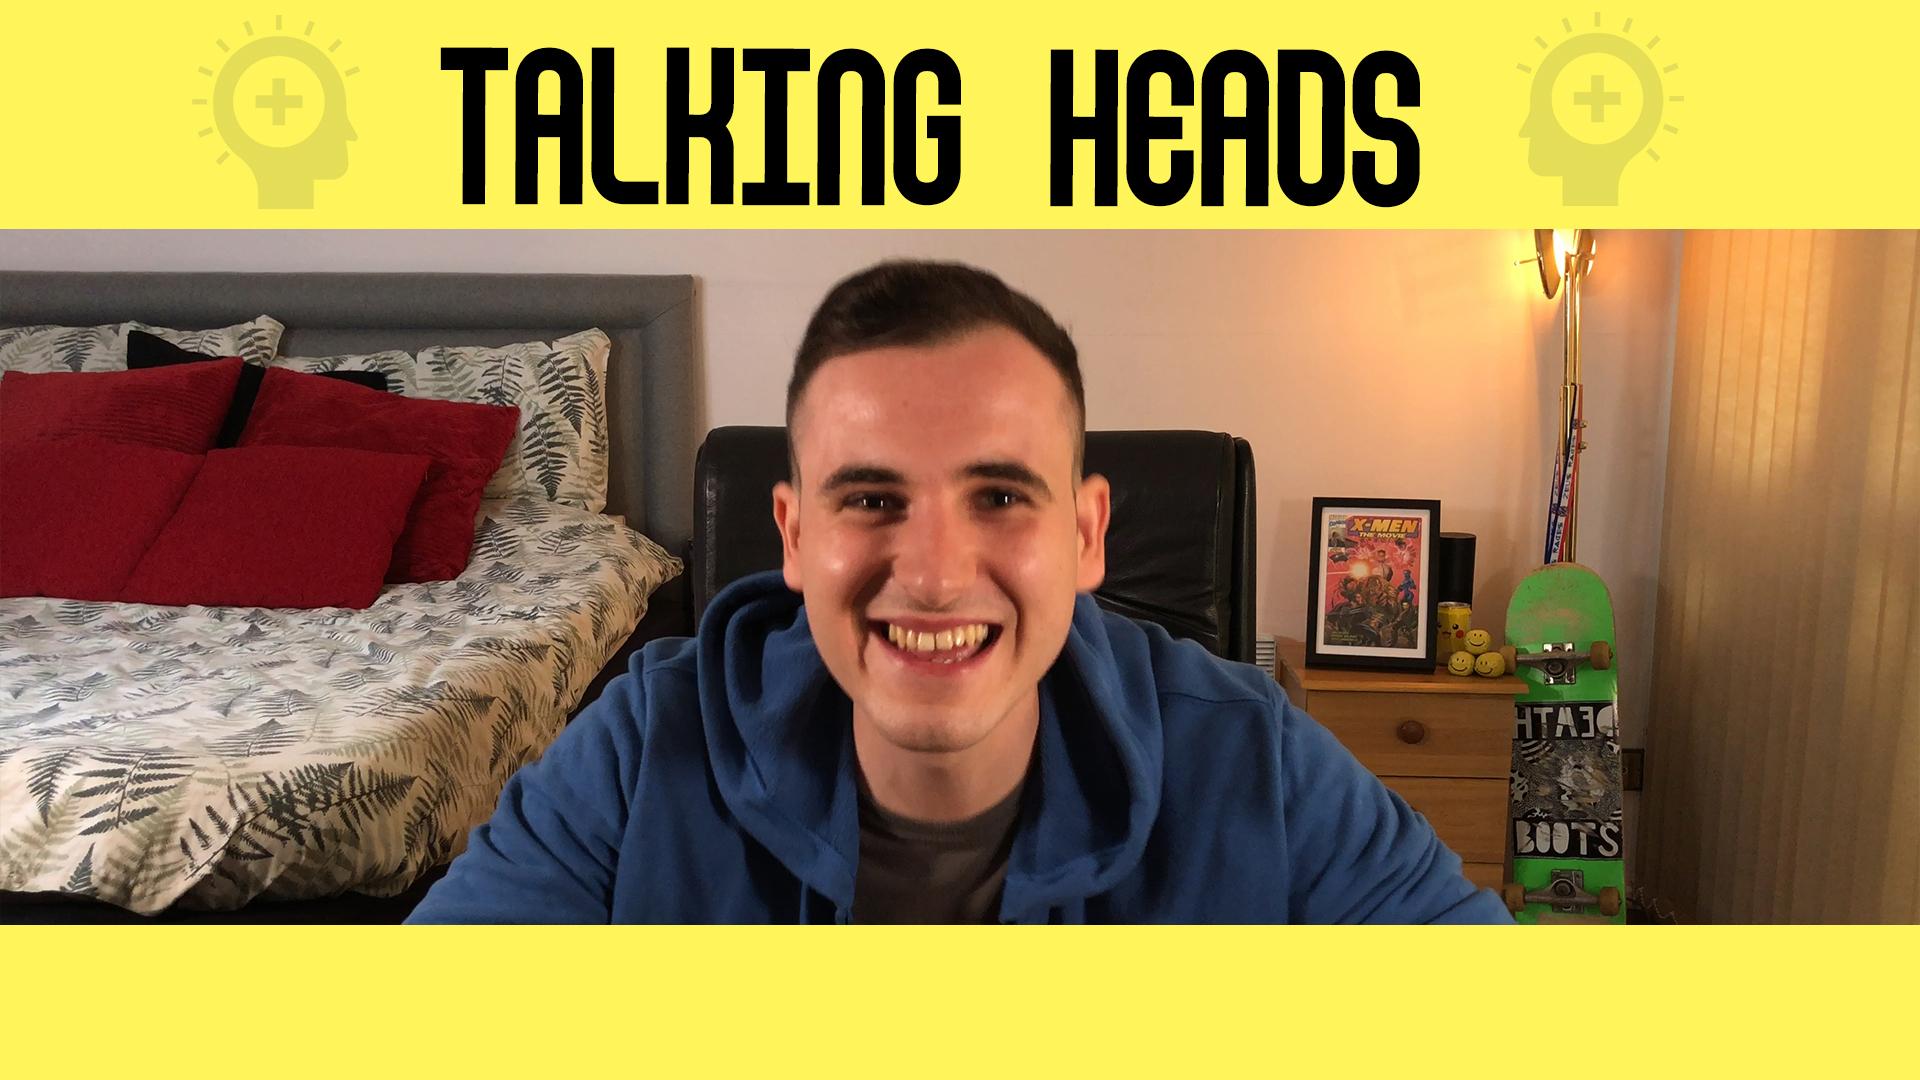 Talking Heads Thumbnail no text.jpg